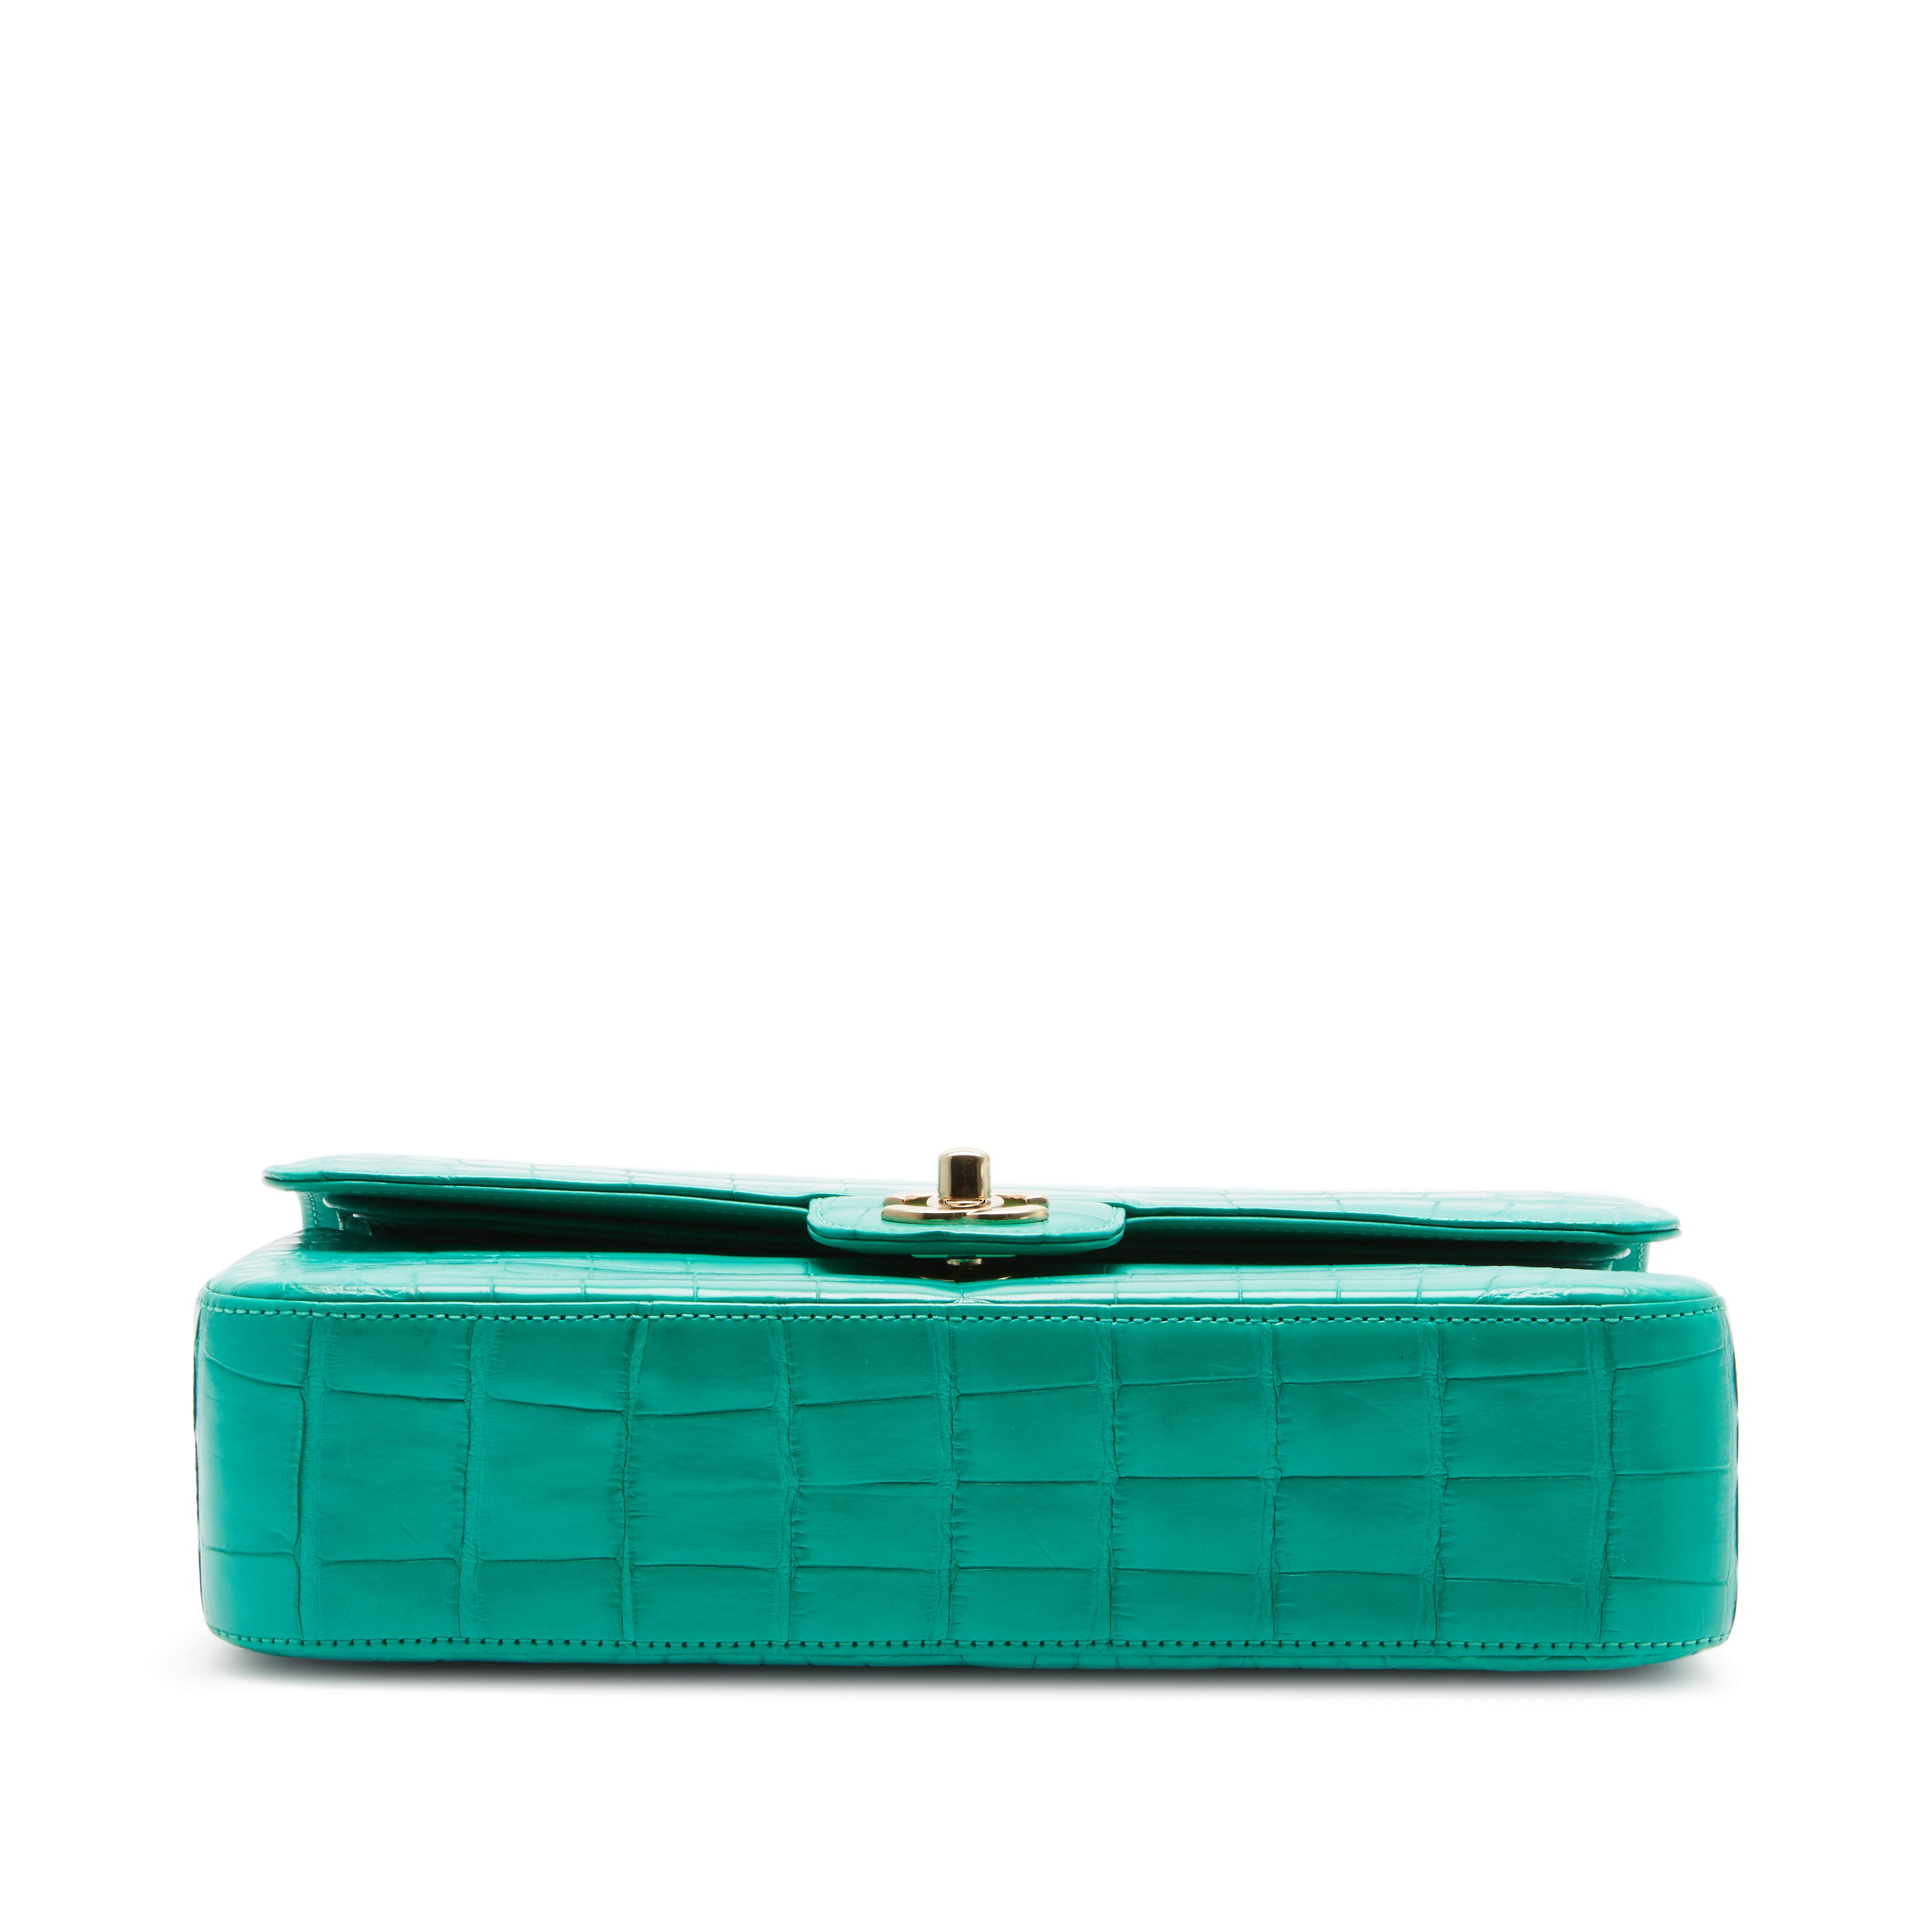 green-alligator-classic-double-flap-255-bag-pale-goldtone-hardwear-2361